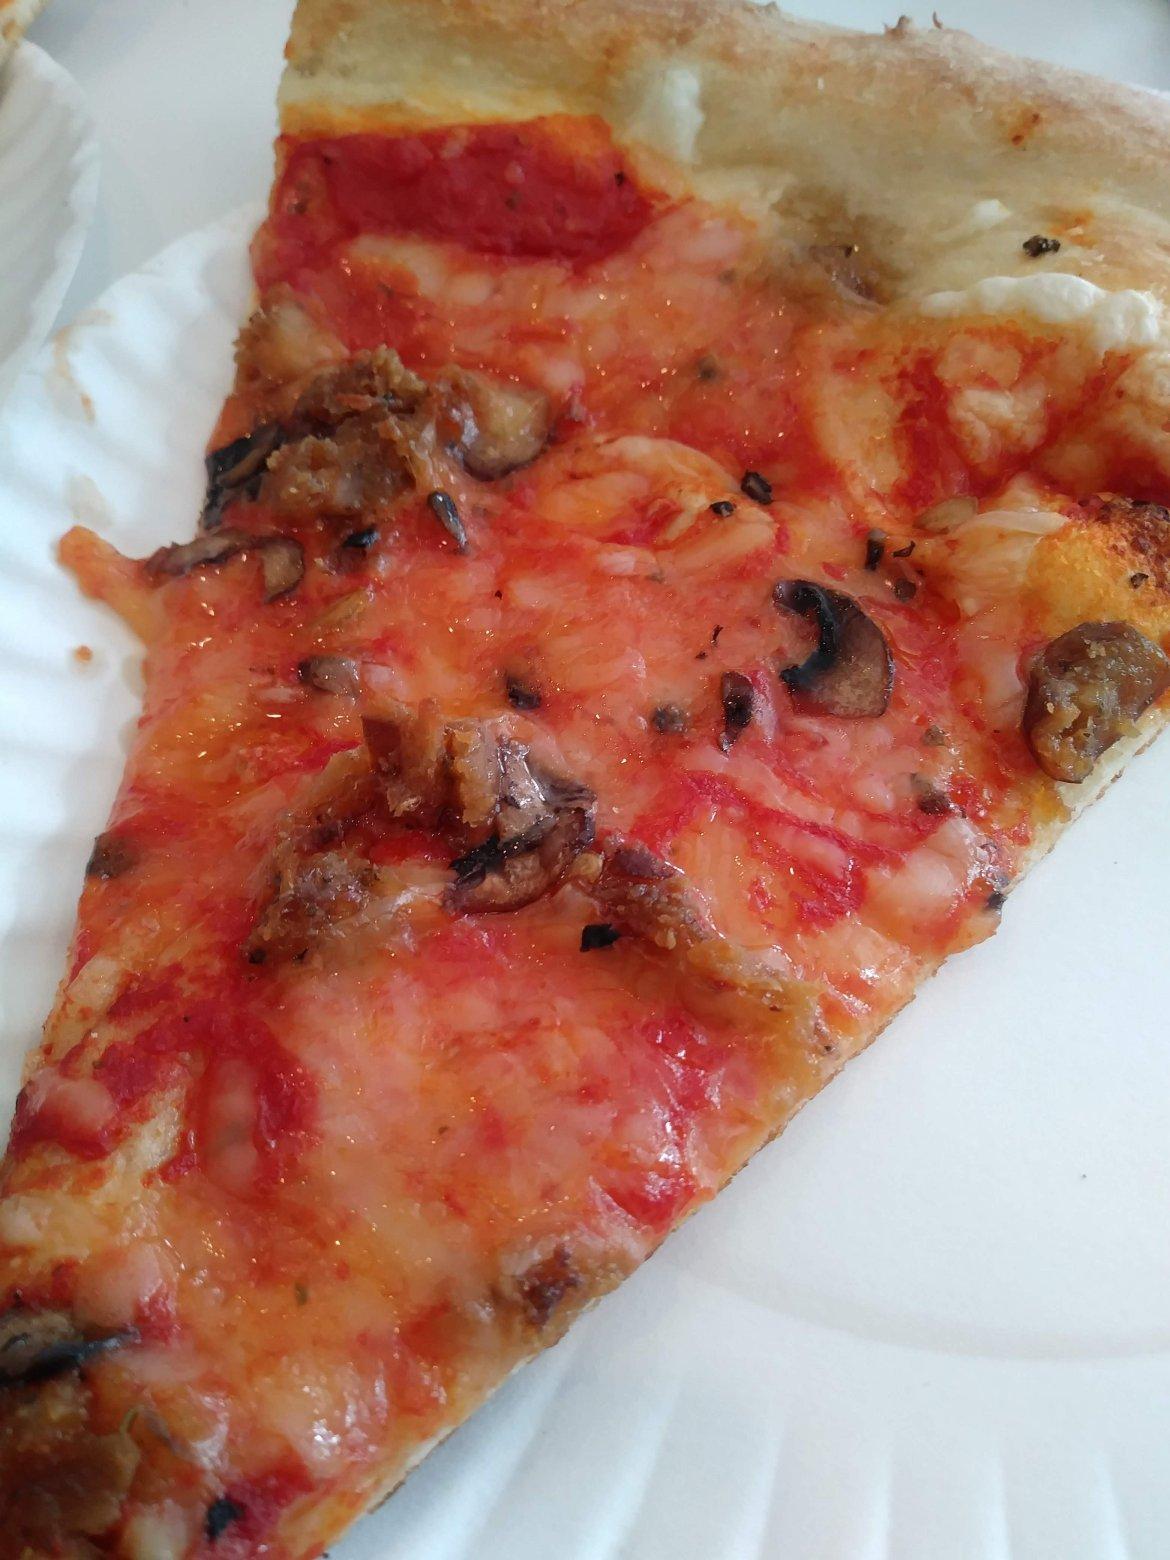 vegan plain cheese pizza at Screamer's pizzeria in New York